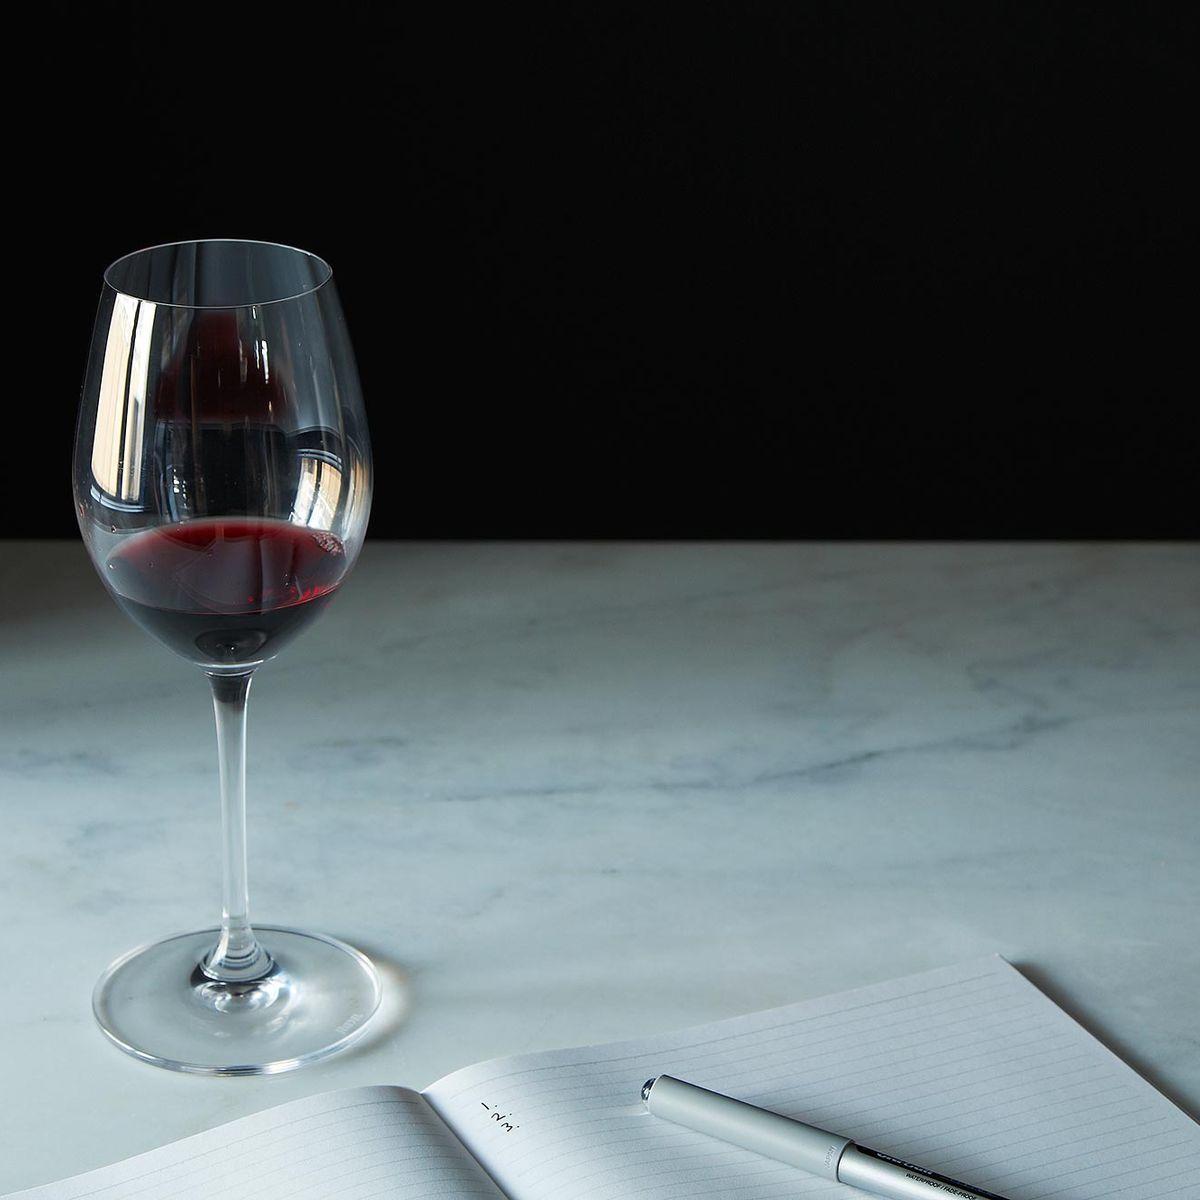 Certified Specialist Of Wine